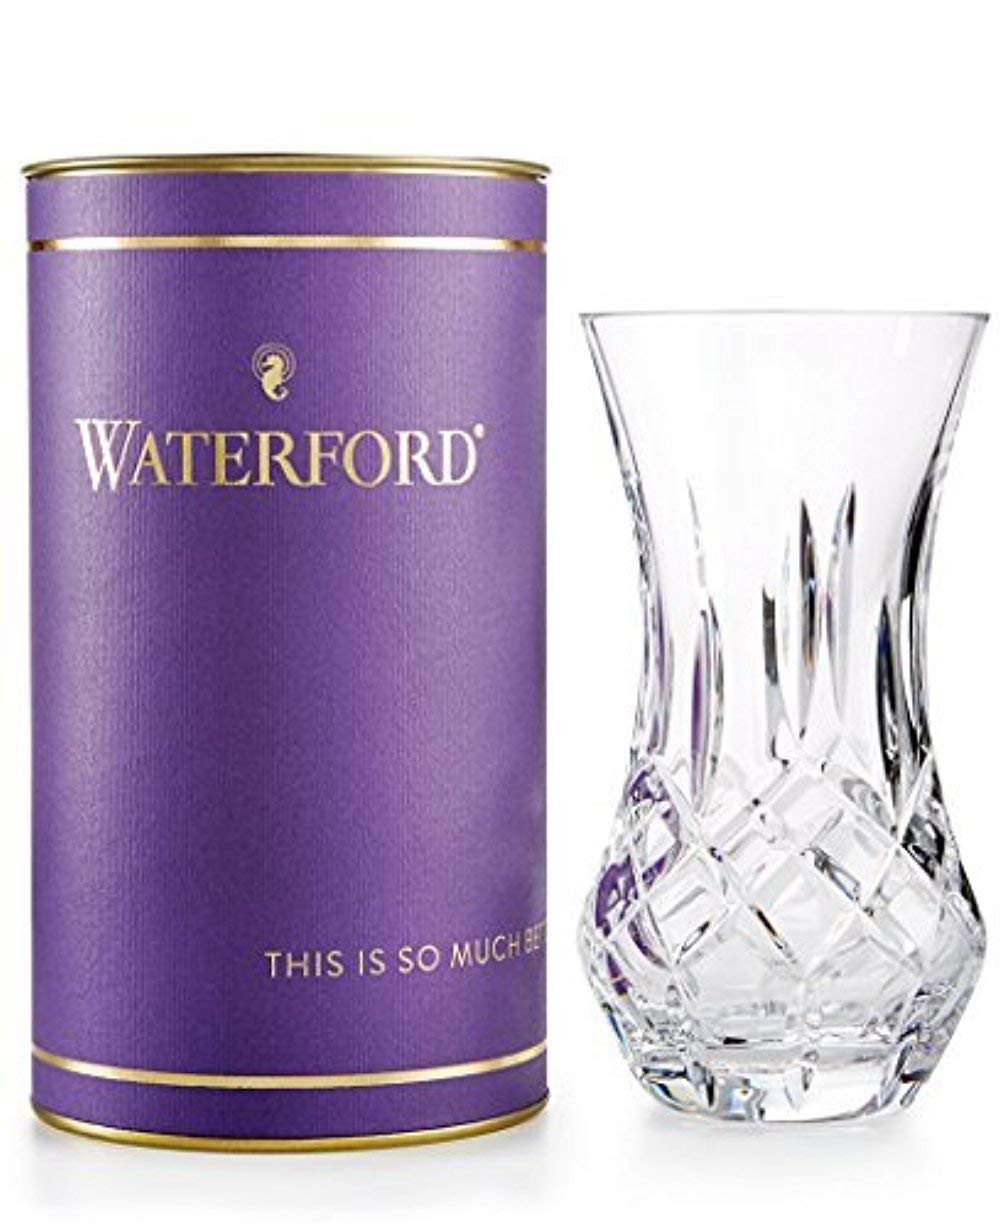 waterford lismore vase 8 of amazon com waterford giftology lismore bon bon 6 vase home kitchen in 619tf7ex ml sl1225